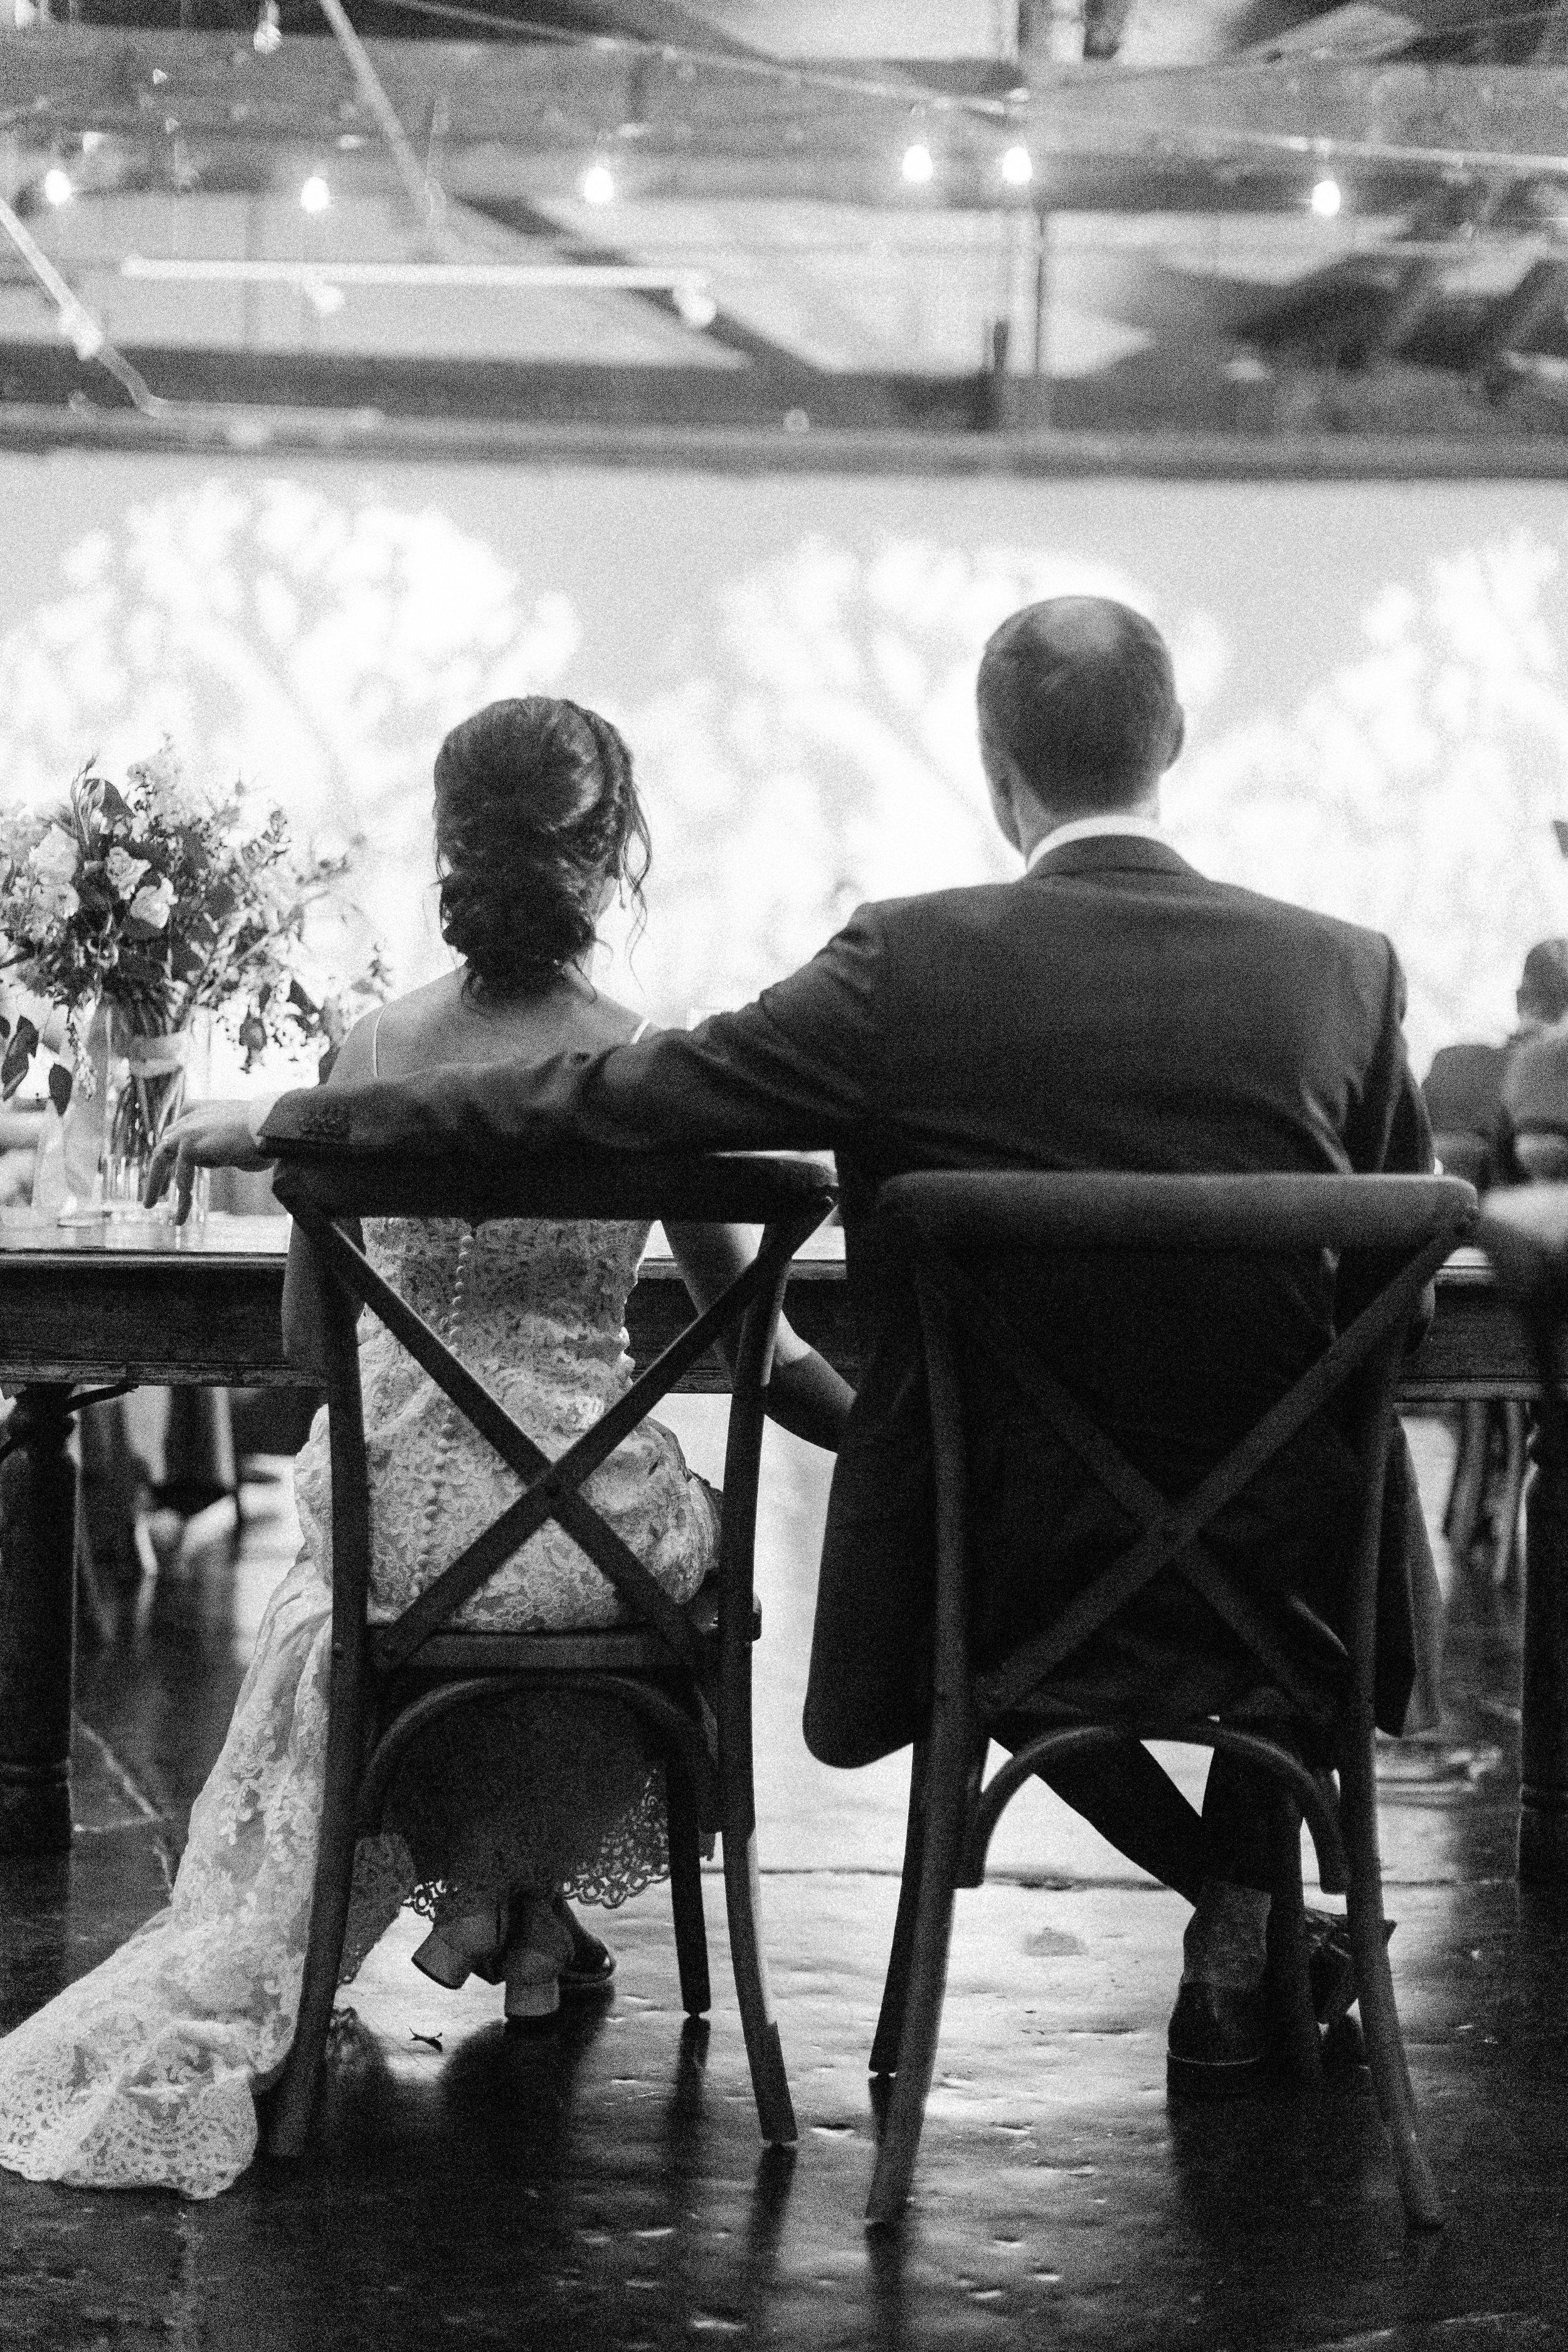 king_plow_atlanta_wedding_art_gallery_modern_lifestyle_documentary_1880.jpg